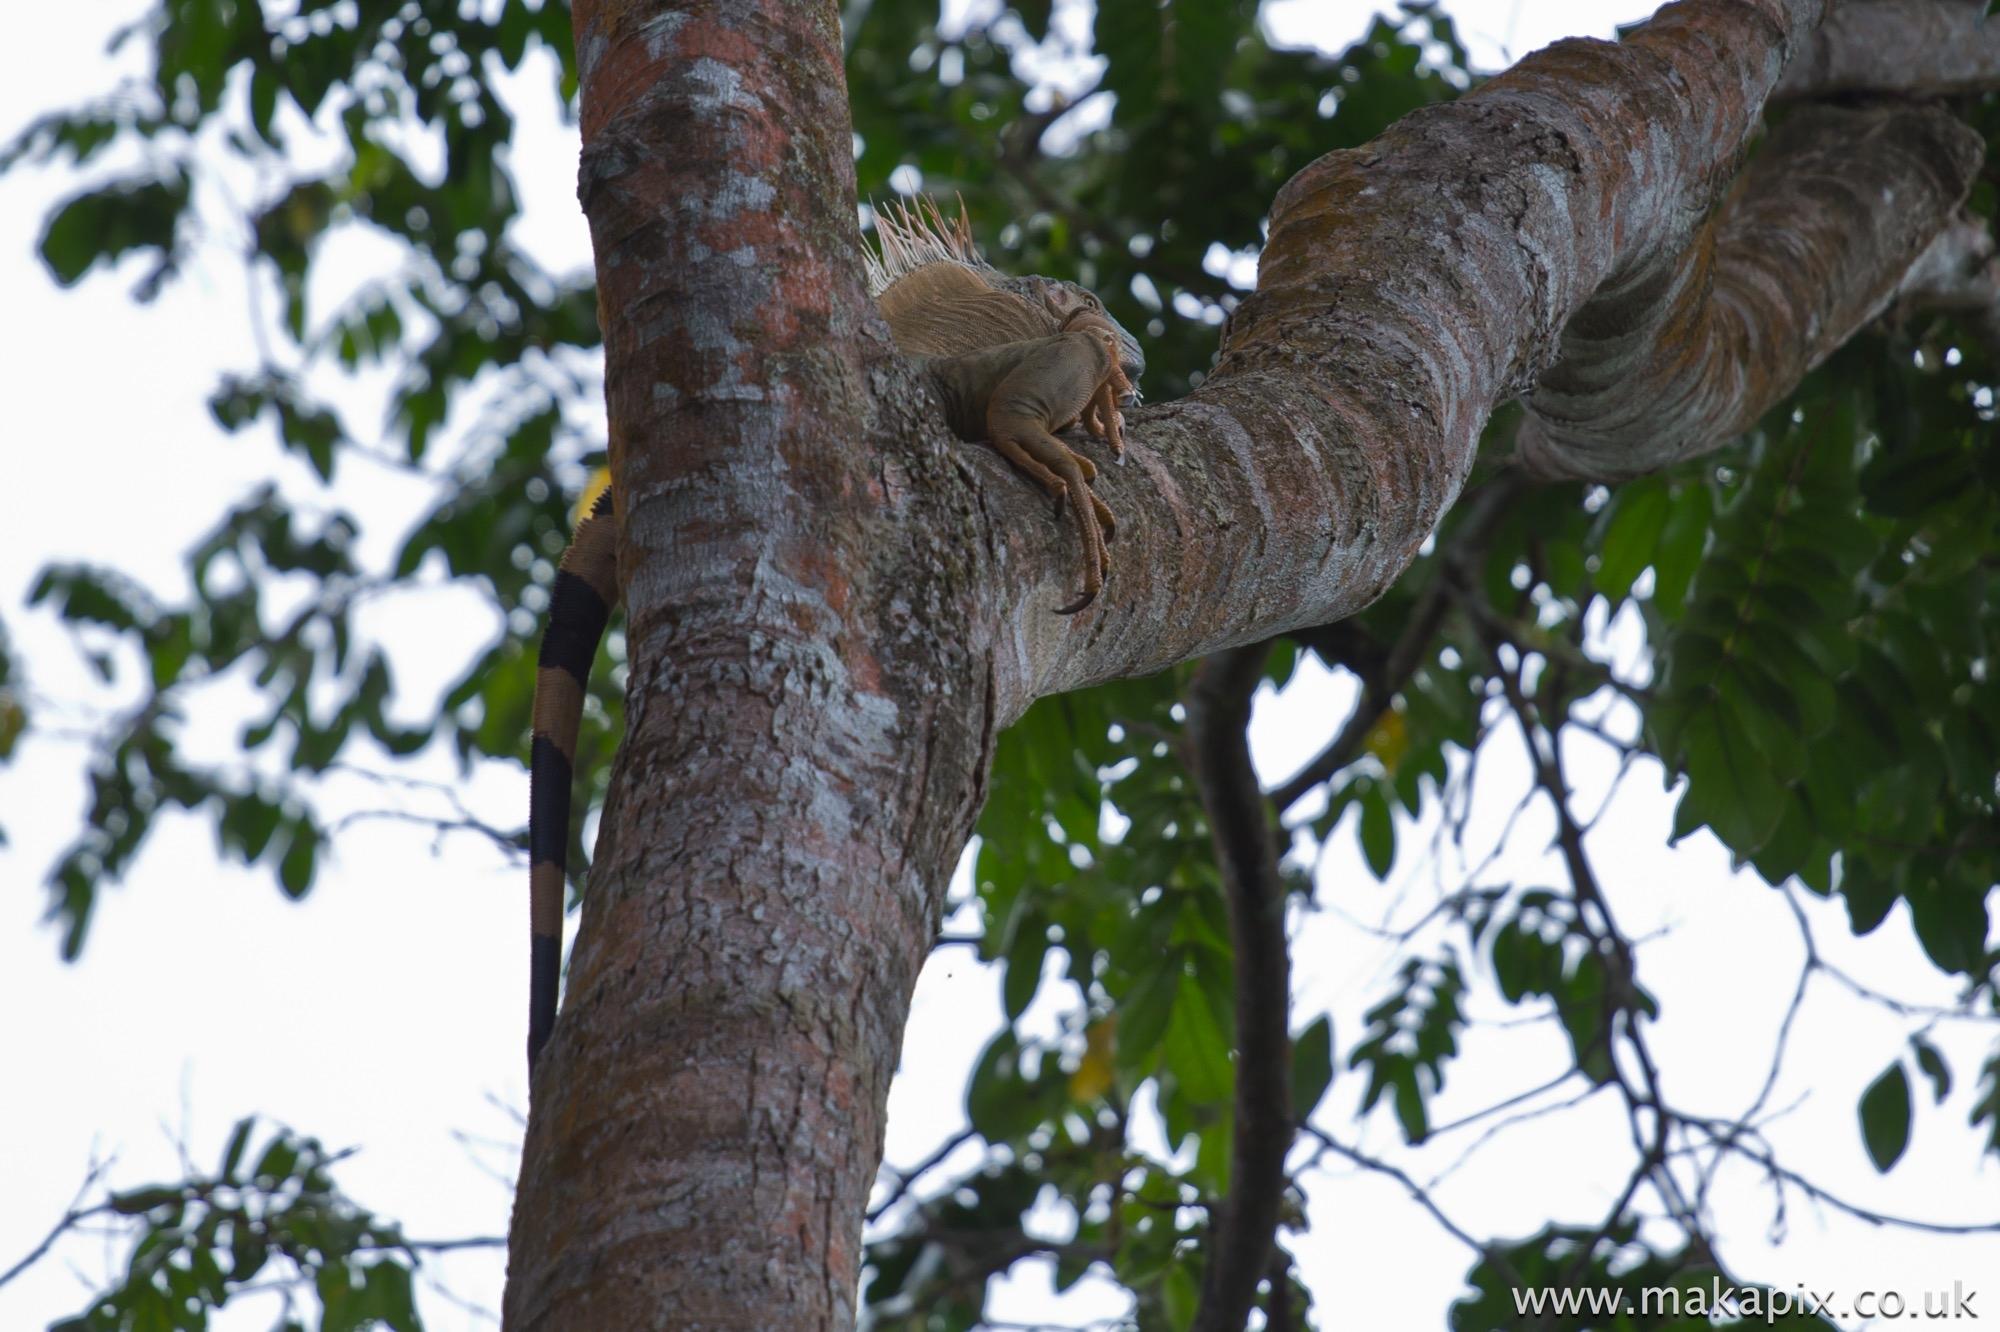 Green Iguana, Costa Rica